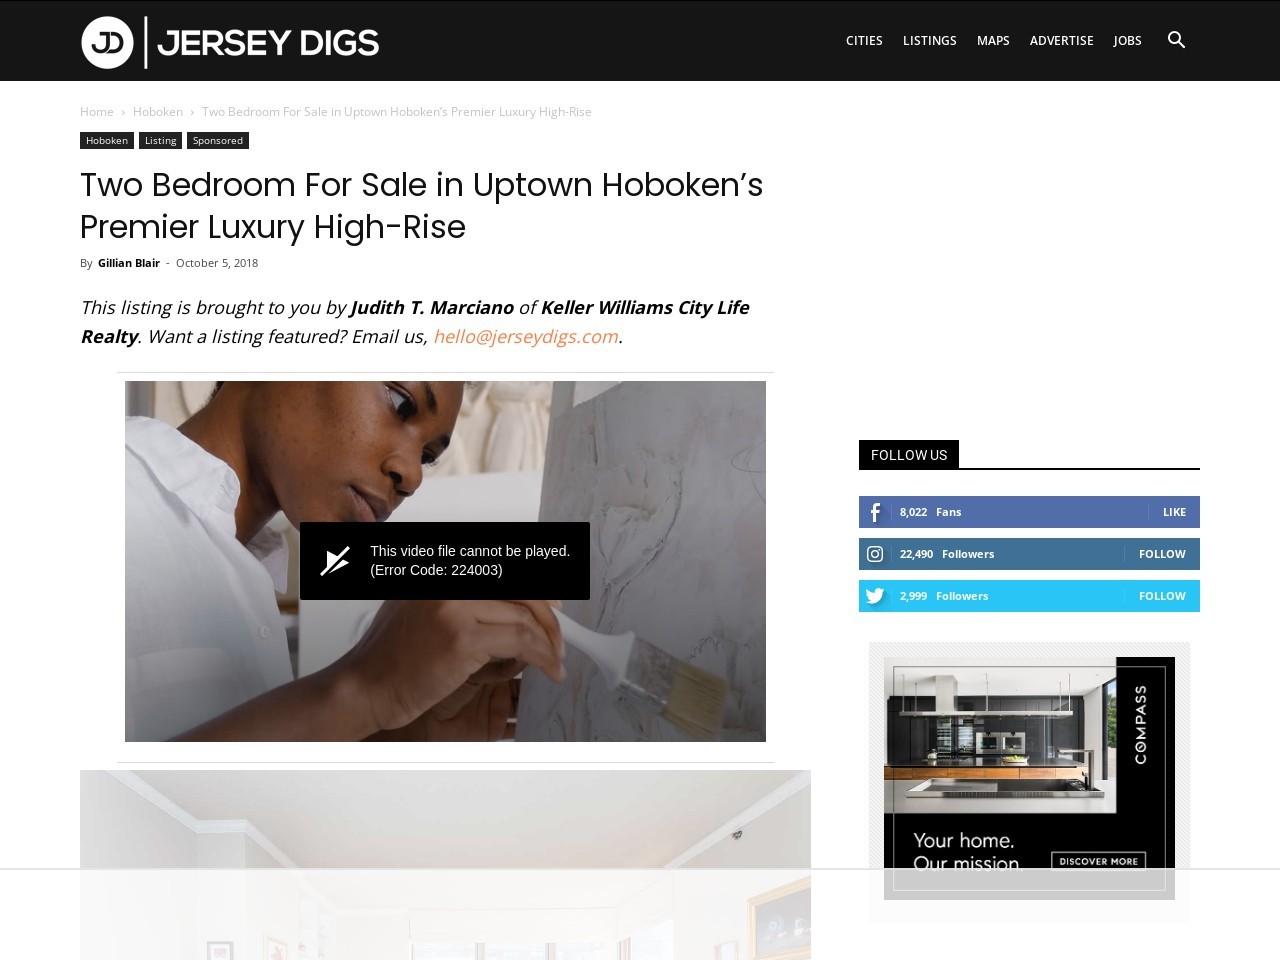 Two Bedroom For Sale in Uptown Hoboken's Premier Luxury High-Rise